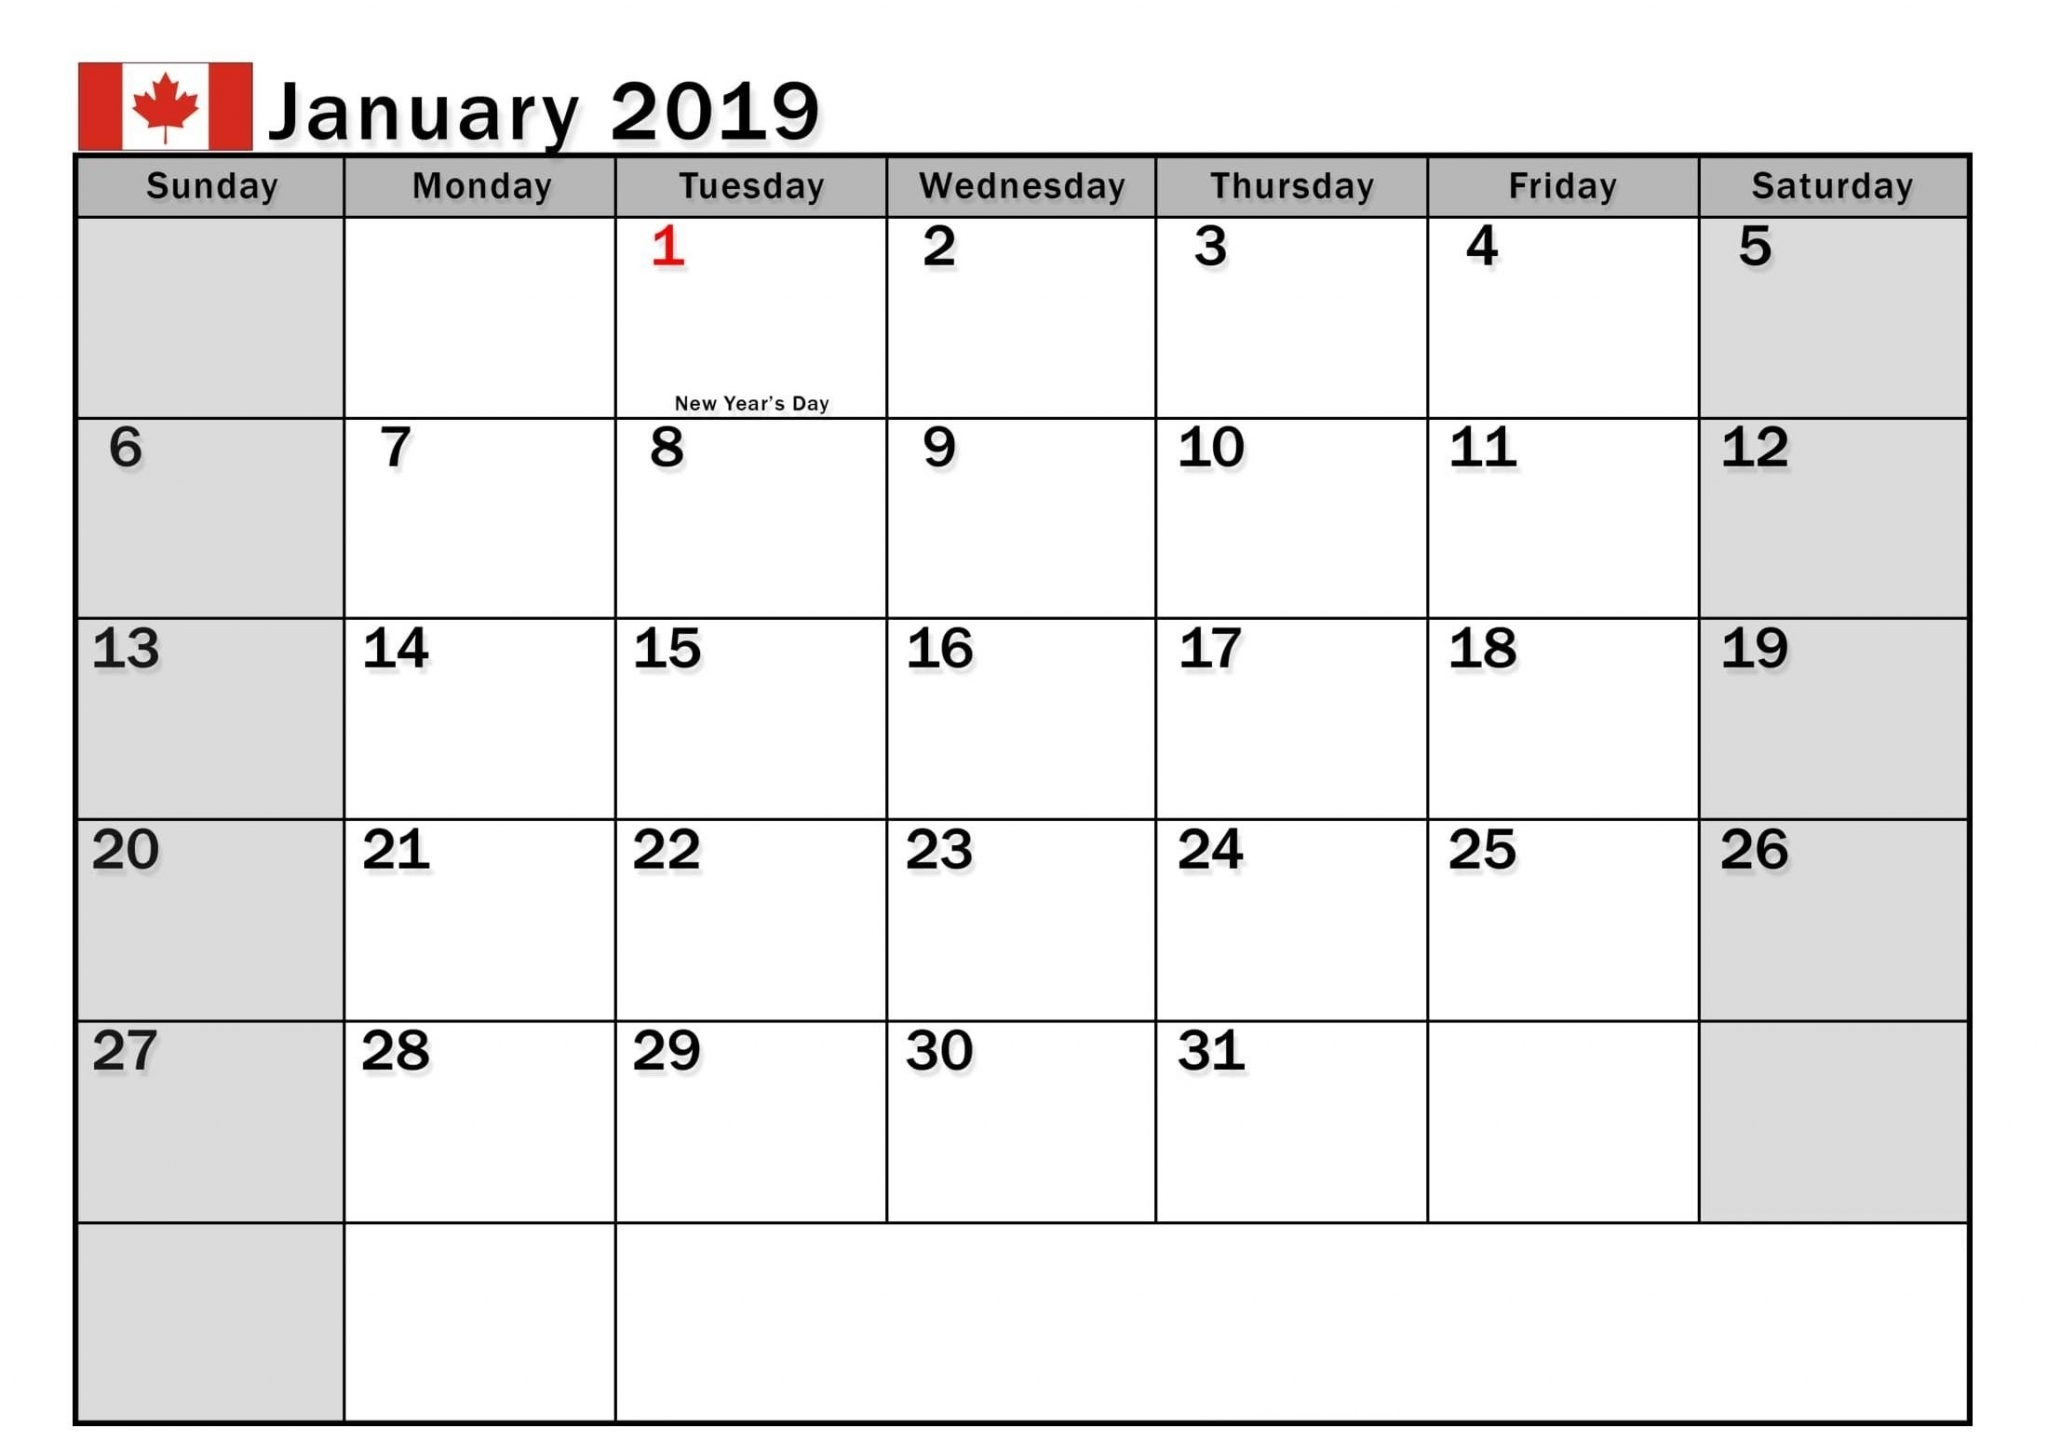 January 2019 Calendar Canada With Holidays - Free Printable